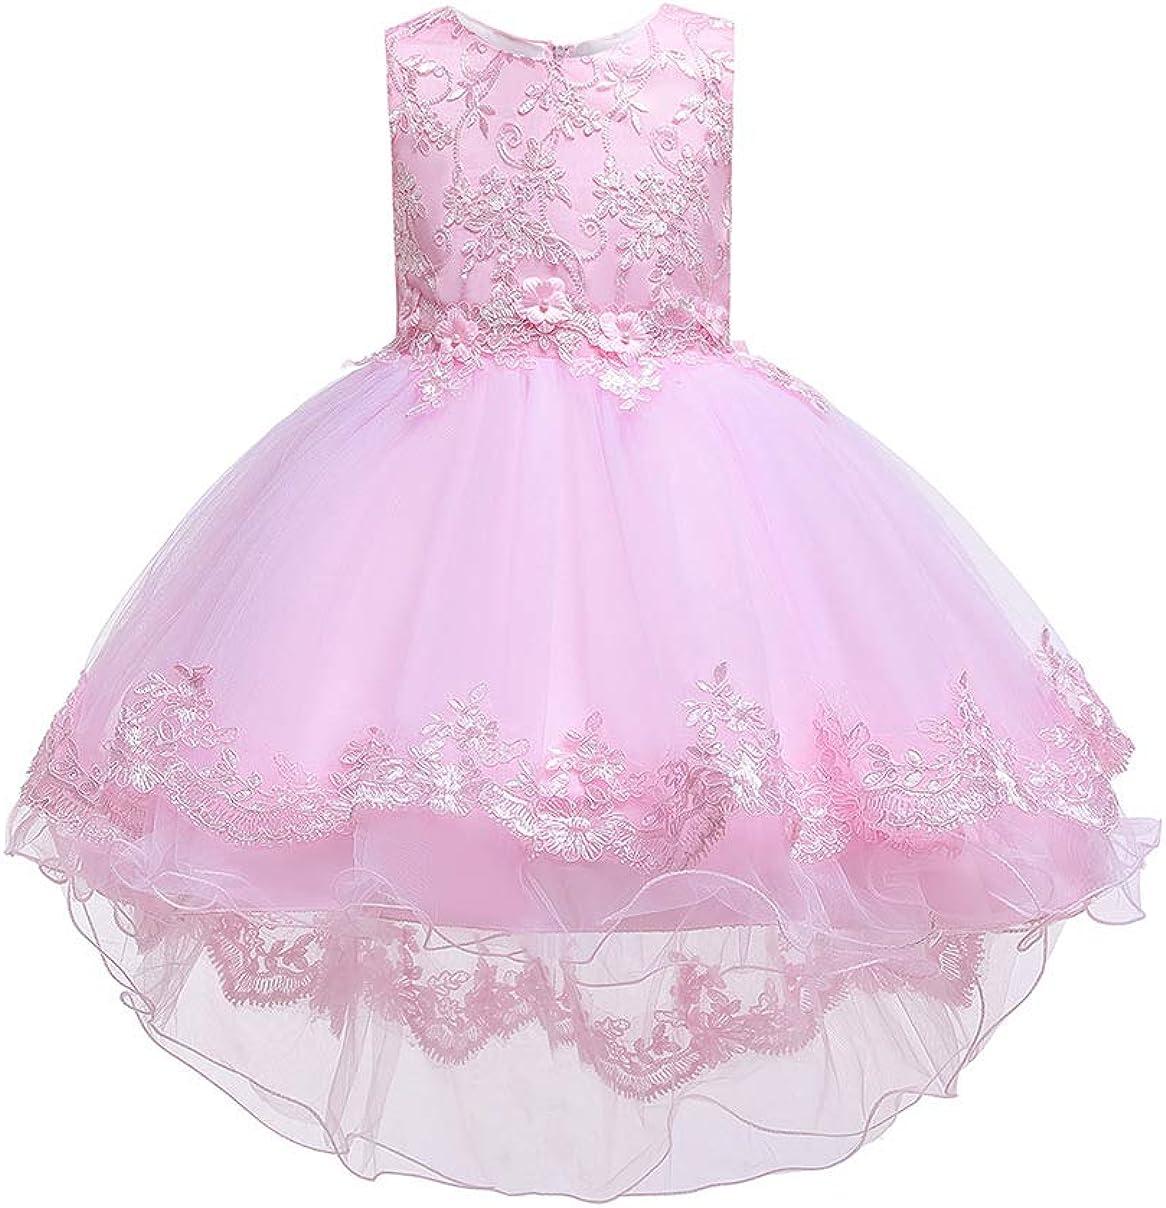 TYQQU Girls Sleeveless Embroidery Dress Tulle Mesh Gown Elegant Round Neck Princess